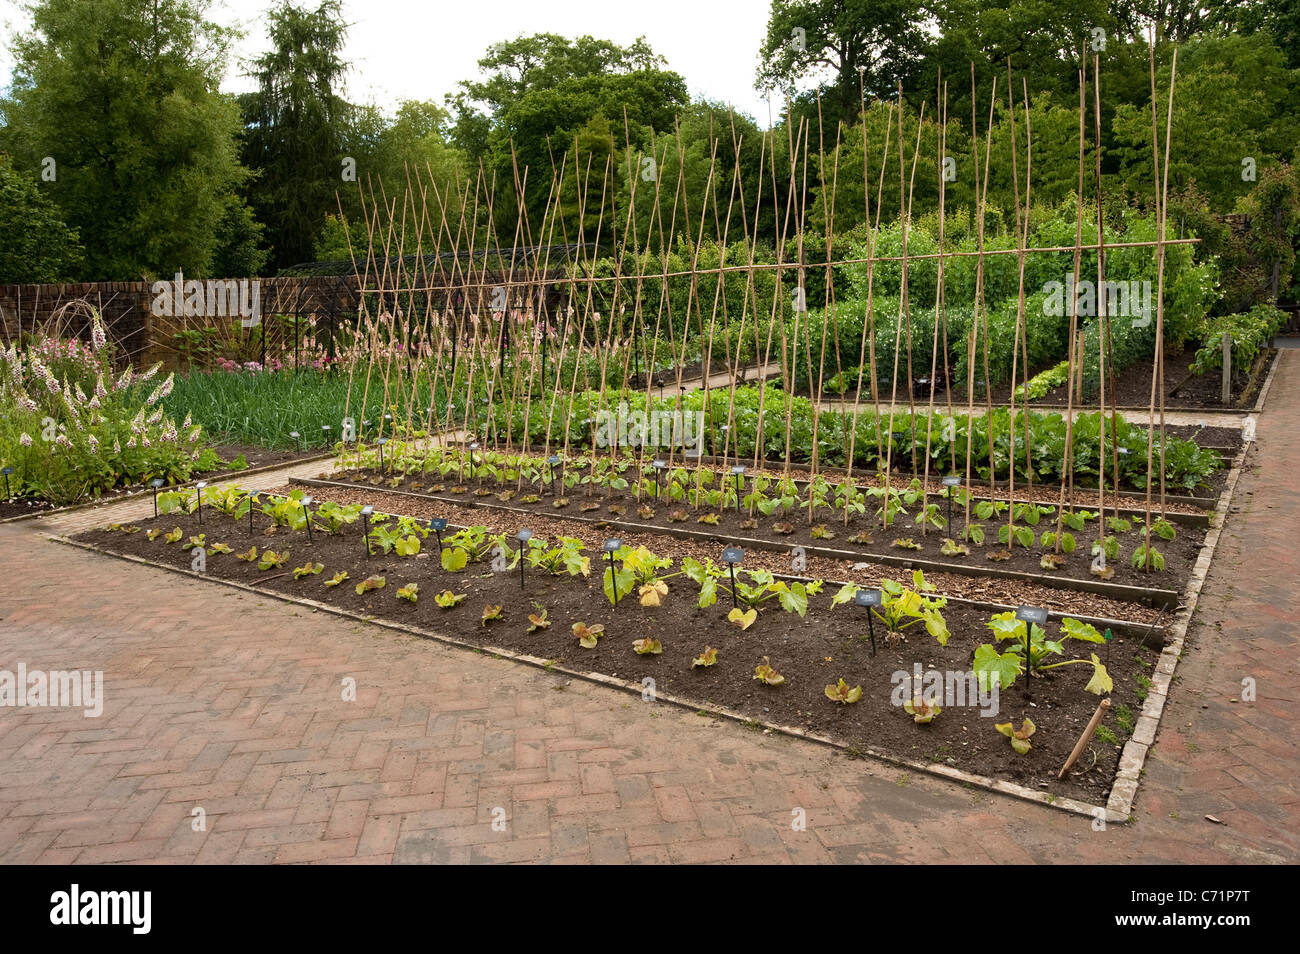 The Fruit And Vegetable Garden In June, RHS Rosemoor, England, United  Kingdom Nice Look